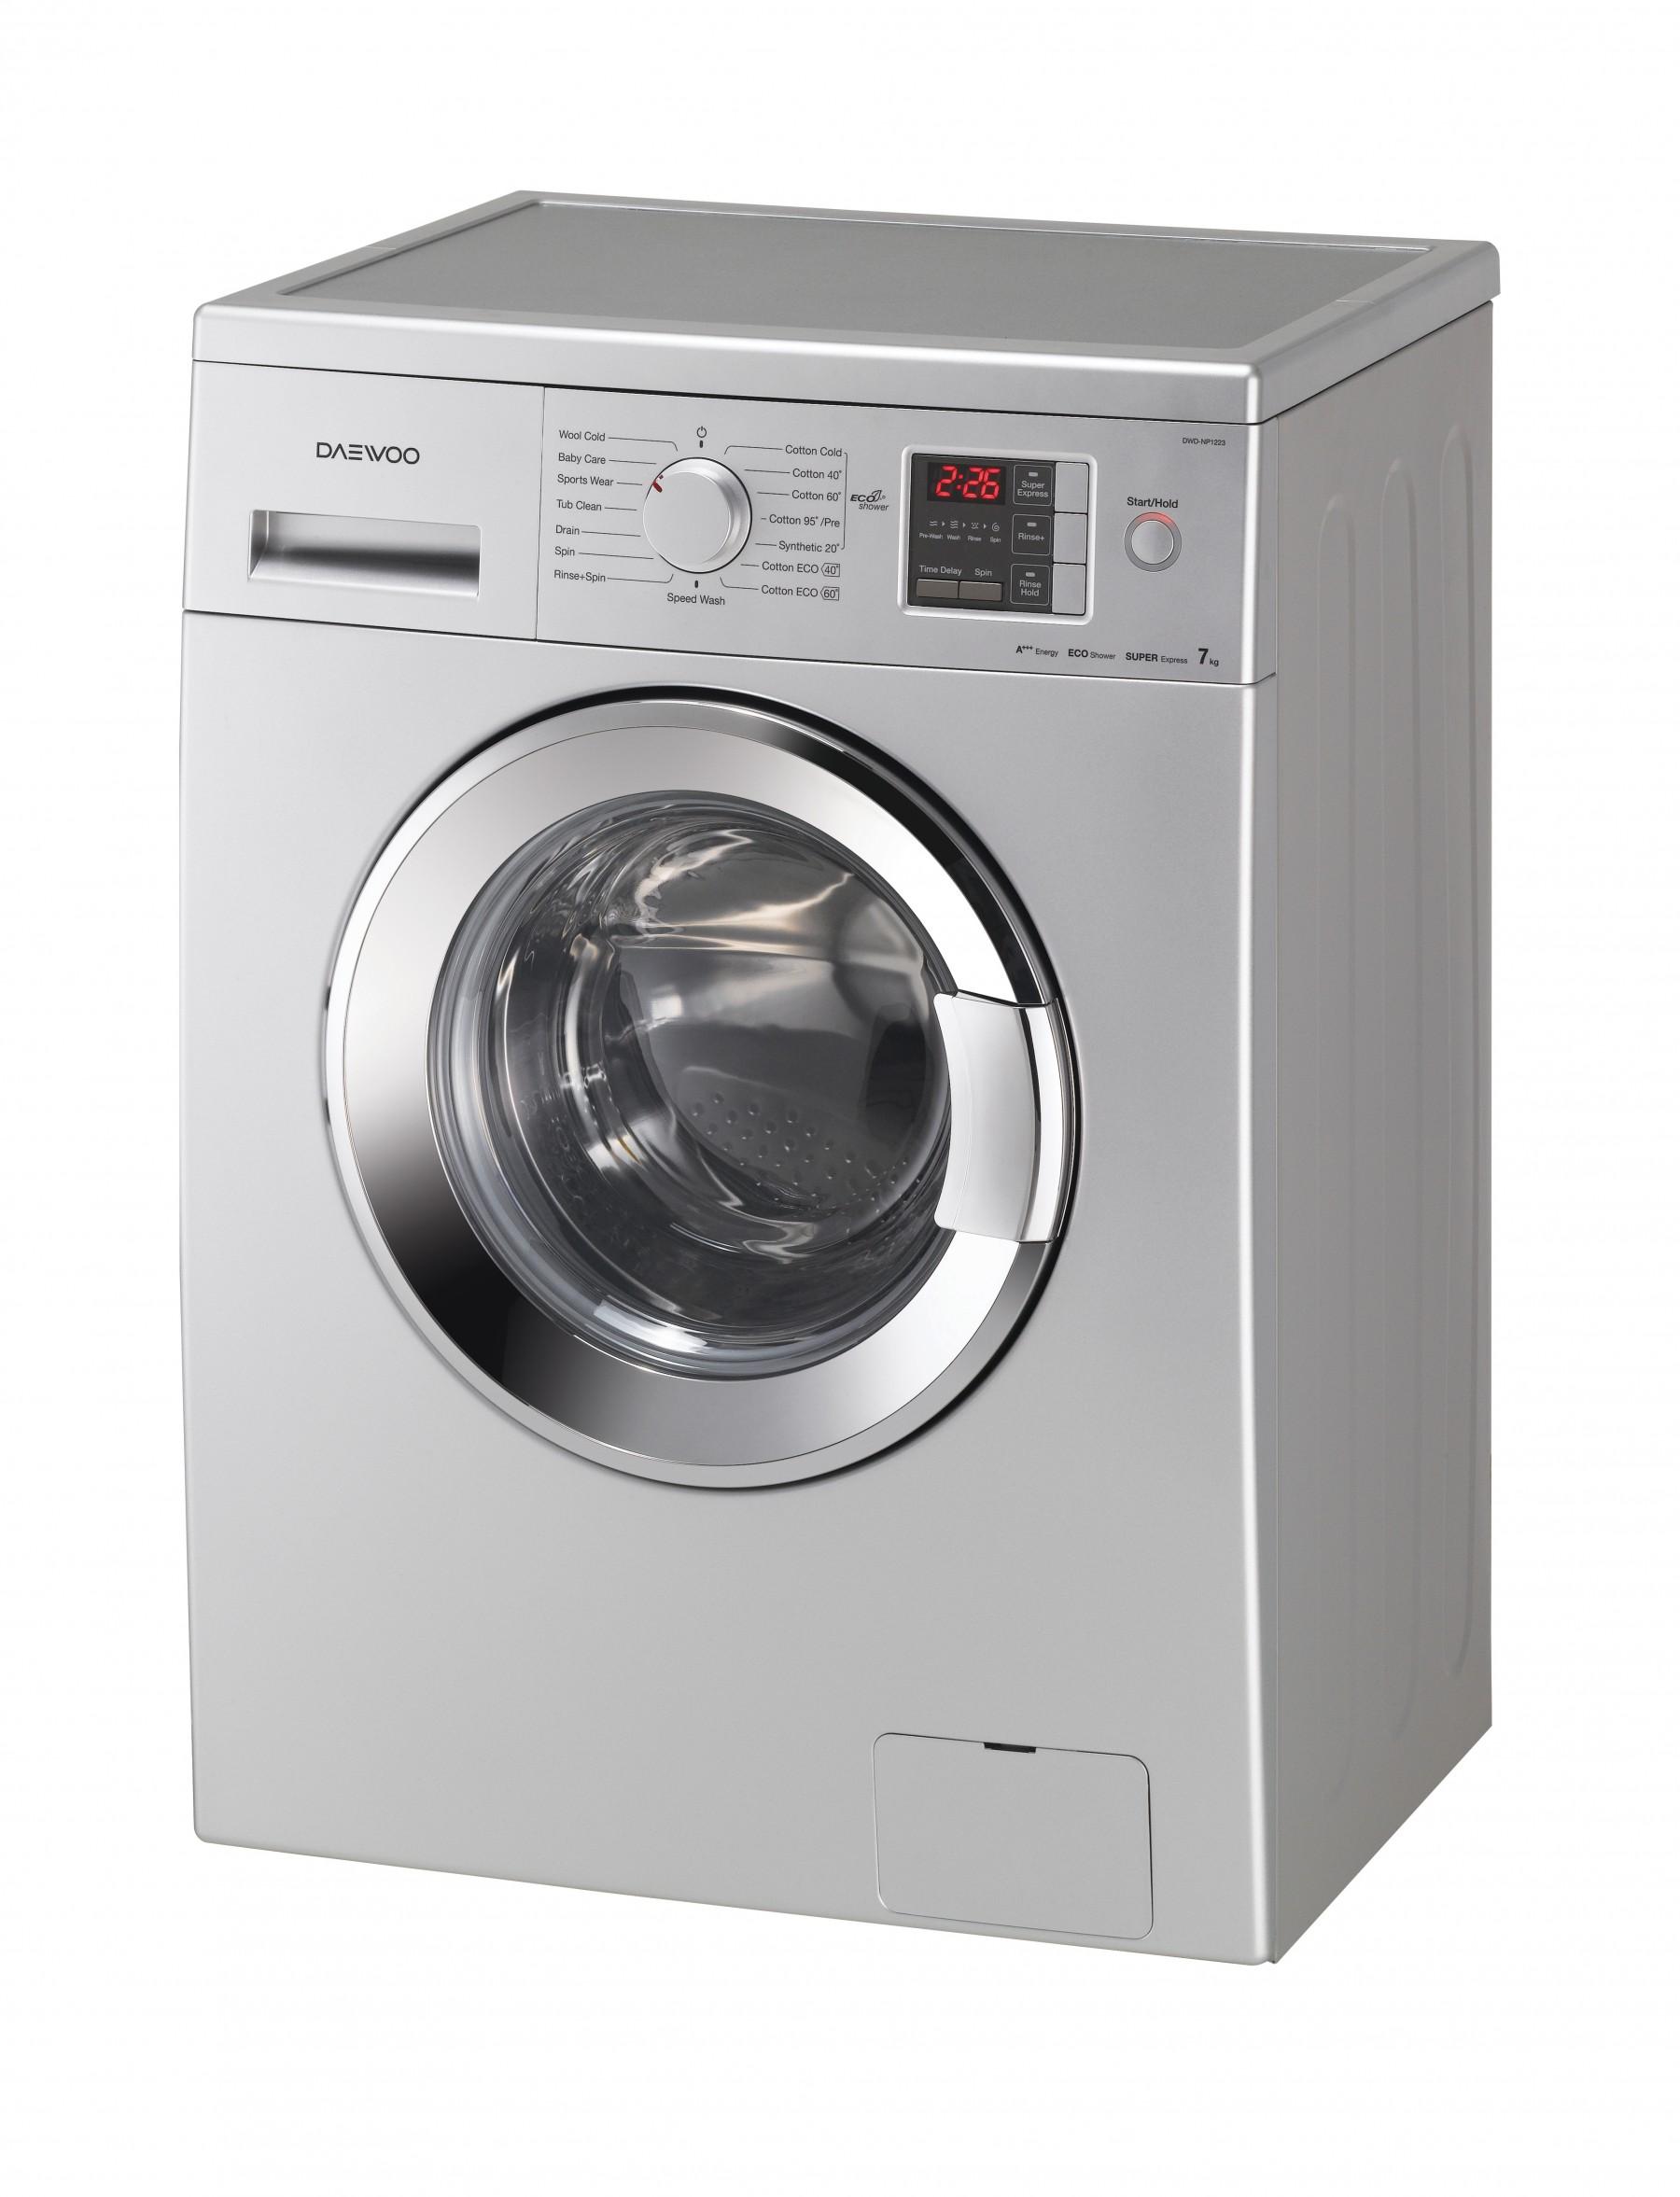 dwd np1223 washing machine 7kg 1200rpm daewoo electronics rh daewooelectronics eu Daewoo Washer and Dryer Parts Daewoo Washer and Dryer